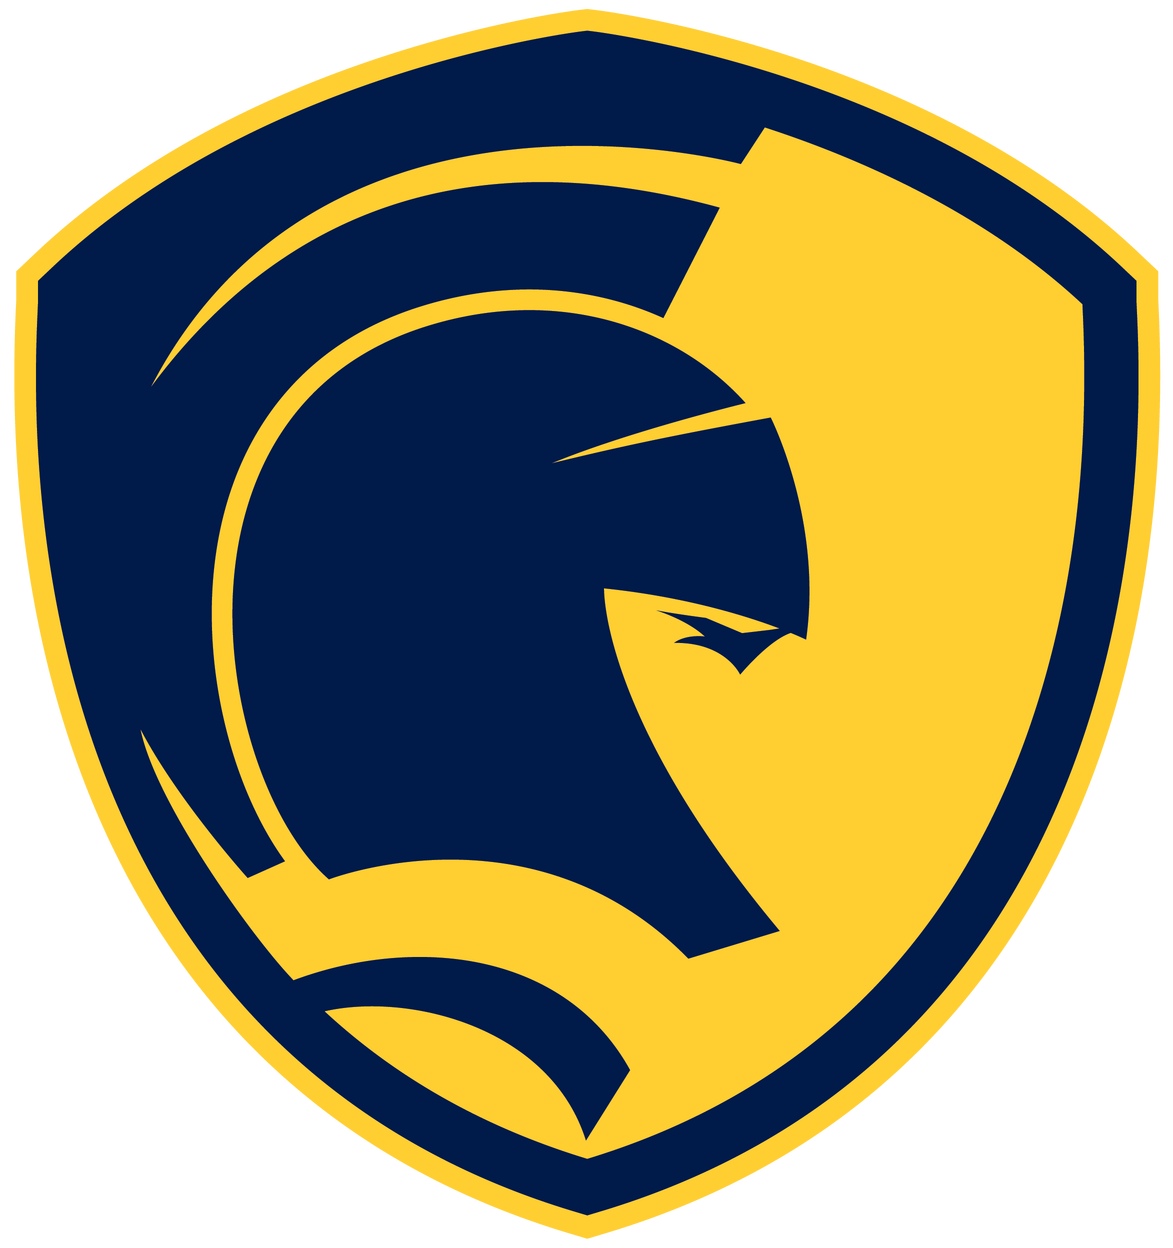 Warriors shield logo